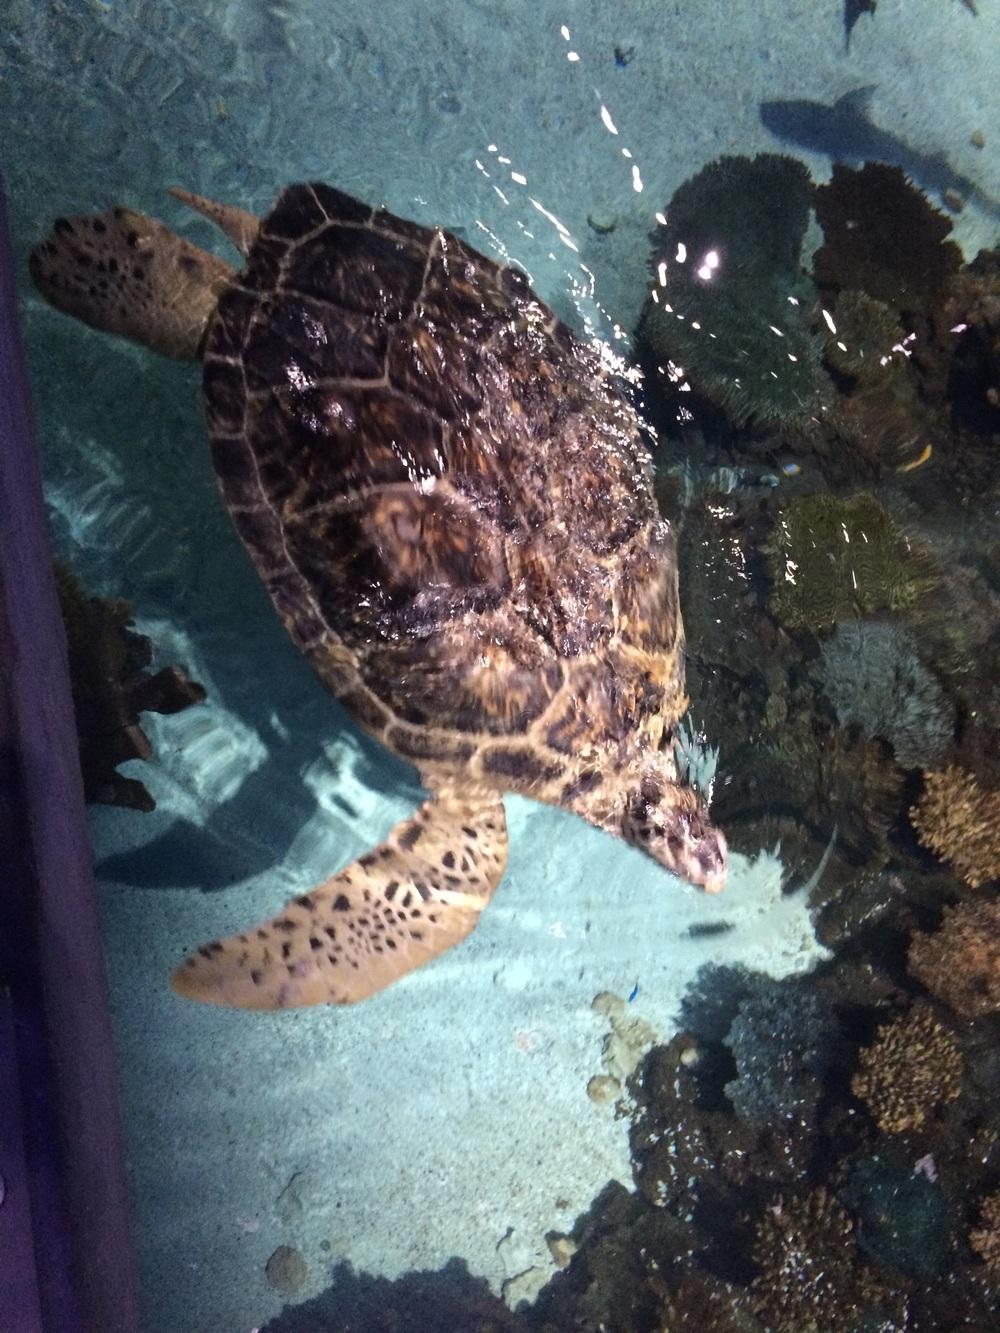 Calypso the turtle